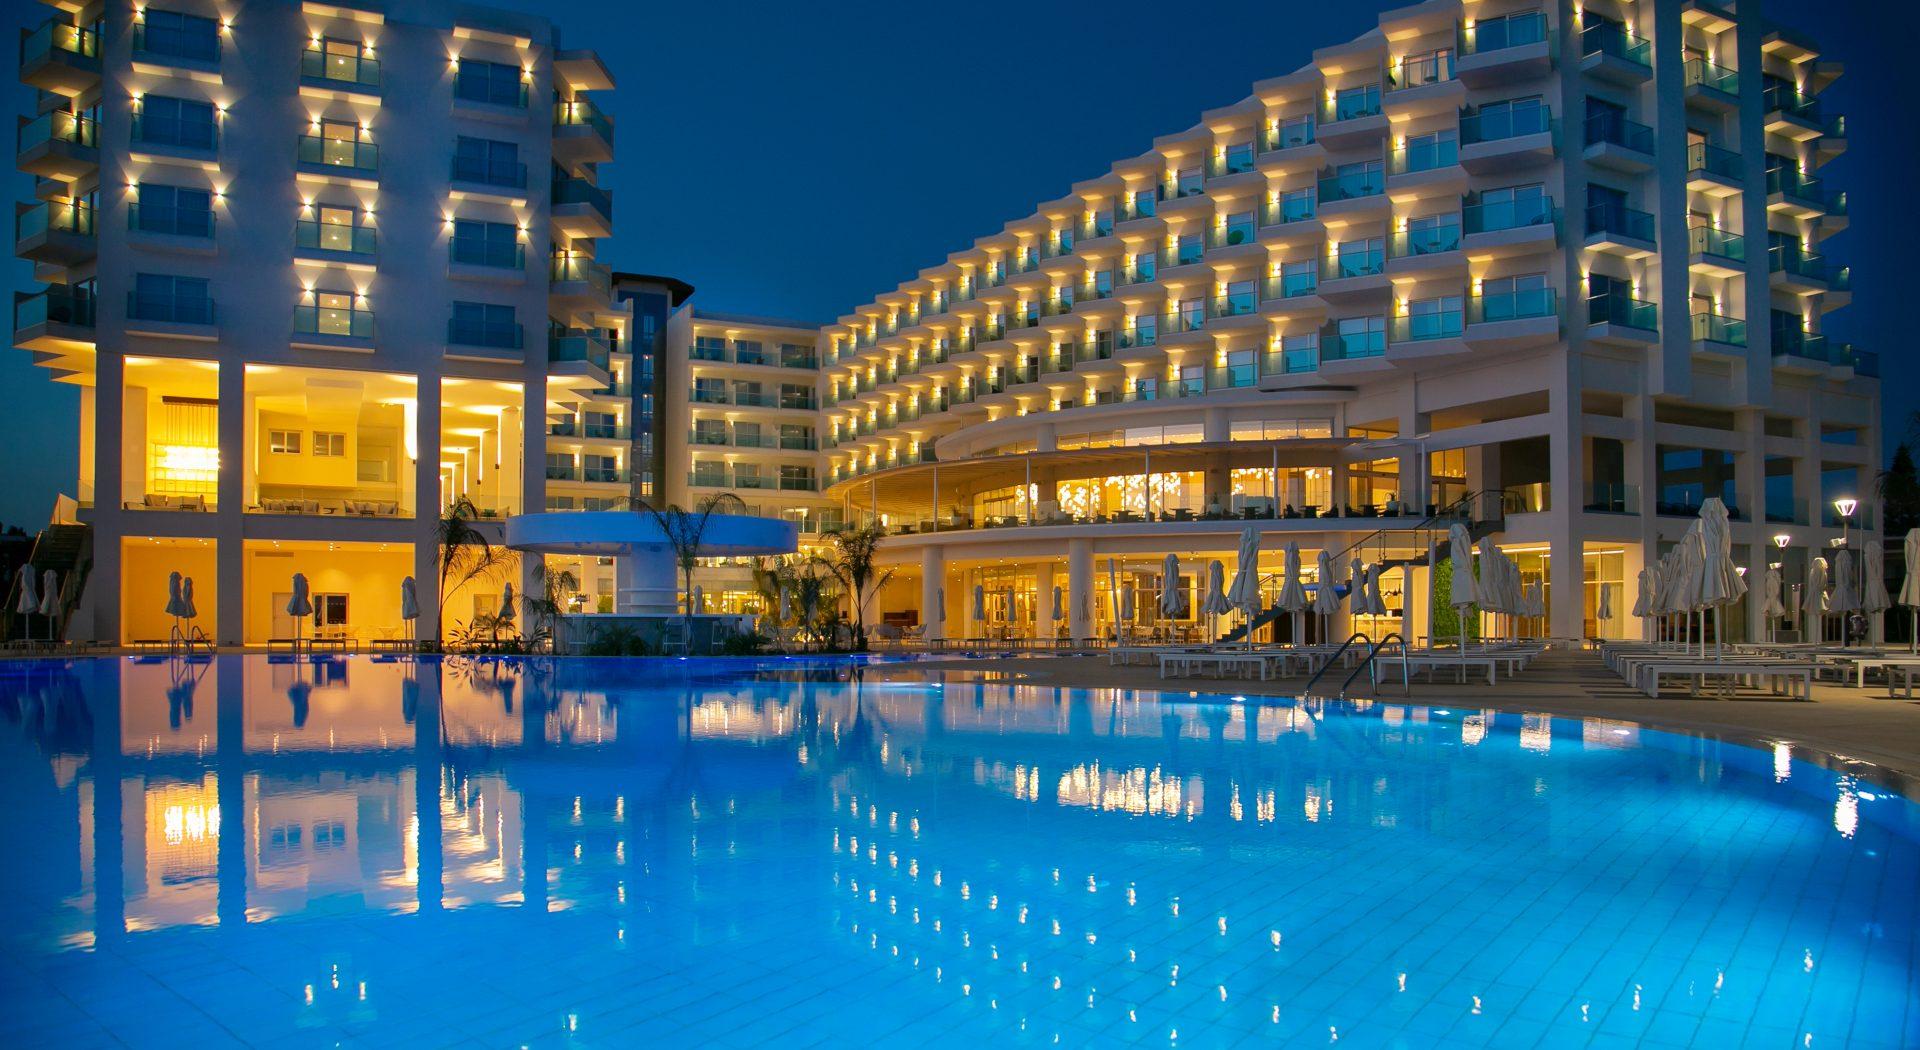 Letovanje, Kipar, Ayia Napa, Hotel Nissiblu Beach Resort, bazen nocu